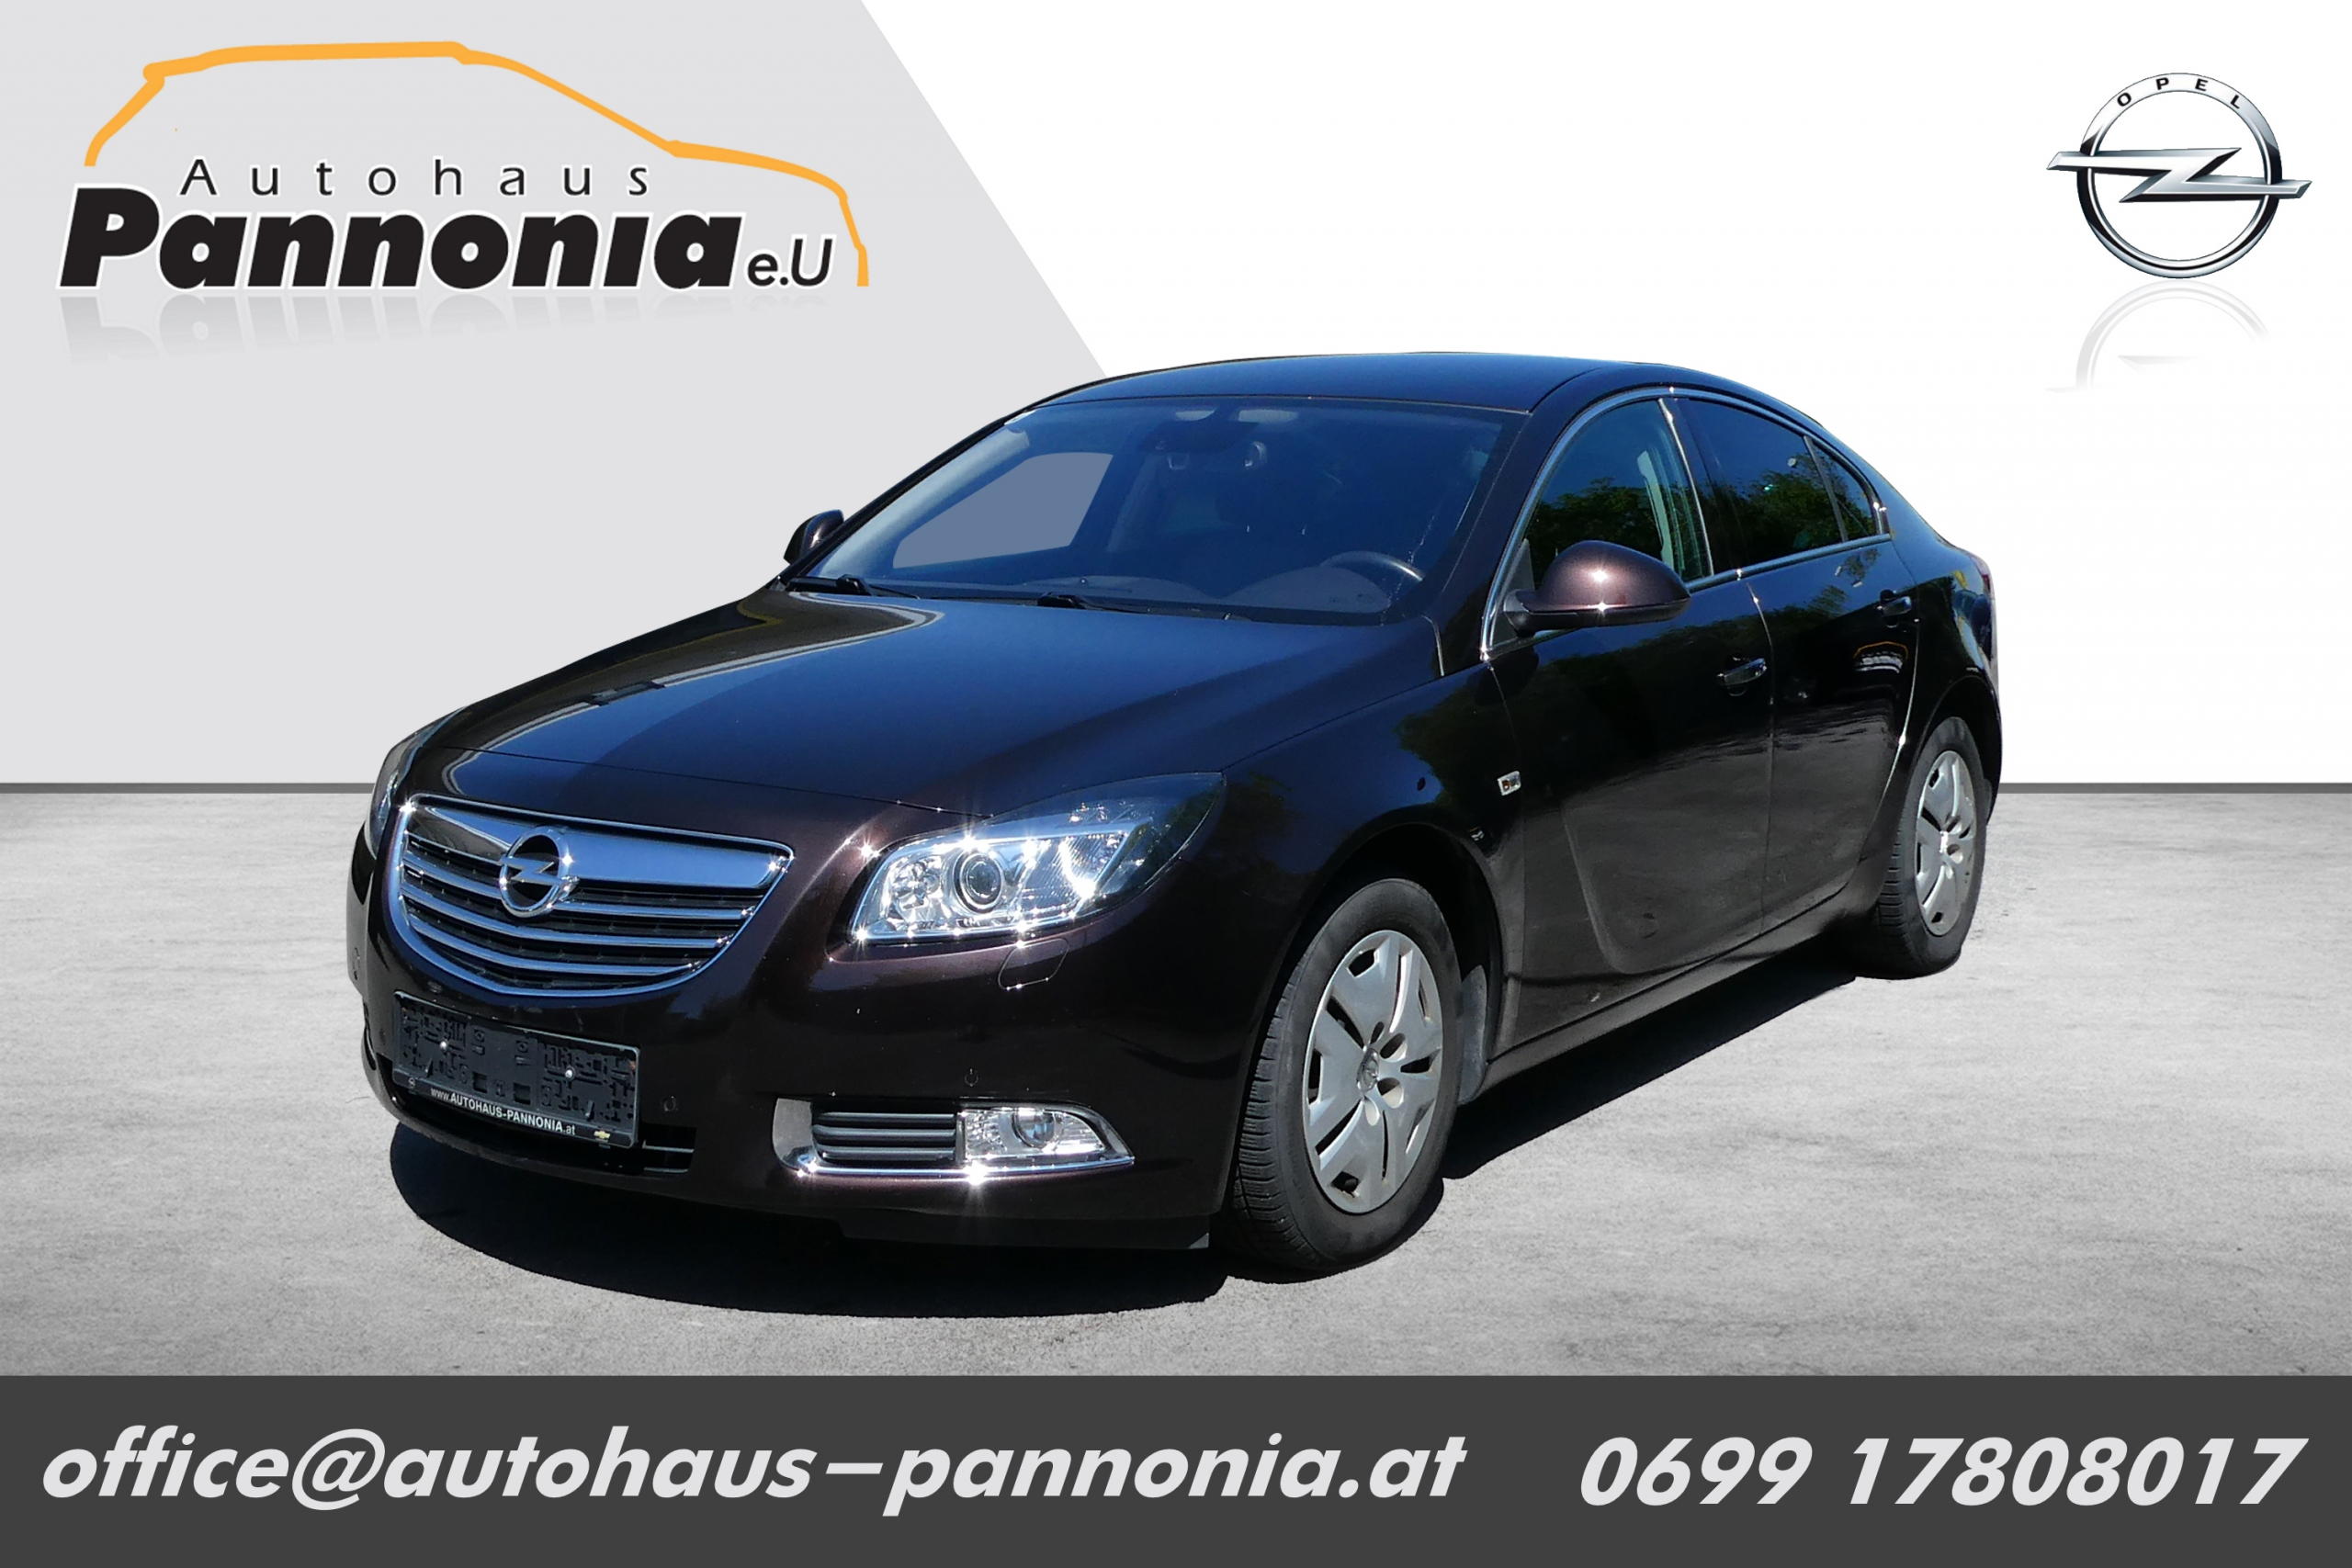 Fotoservice Opel Pannonia